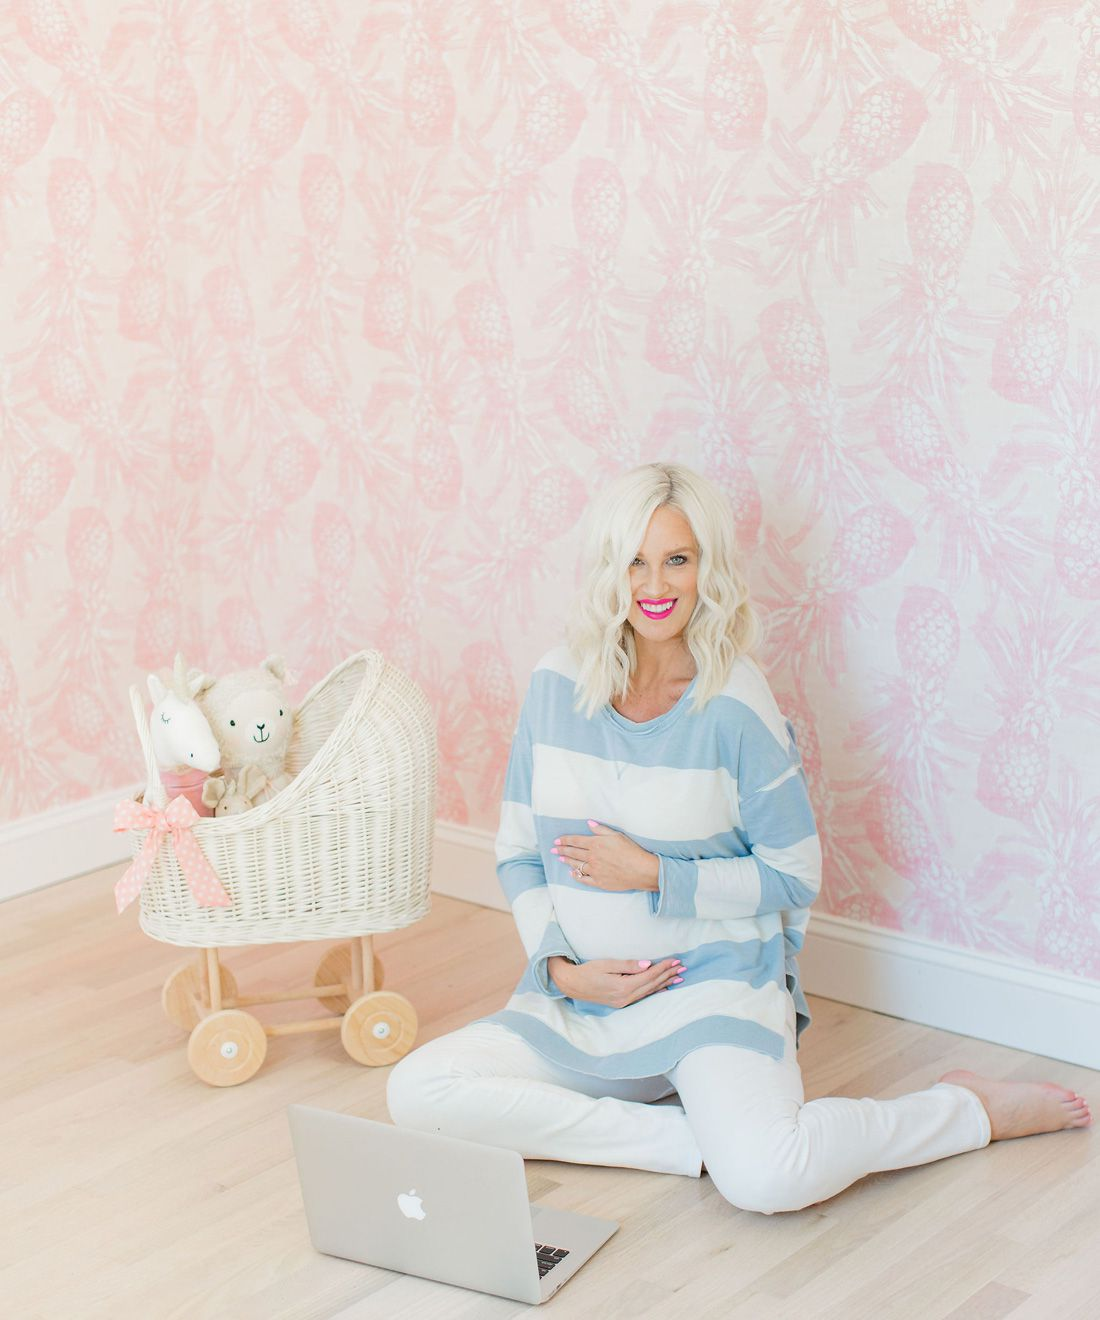 Calypso Wallpaper • Pink Wallpaper • Nursery Wallpaper • Pineapple Wallpaper